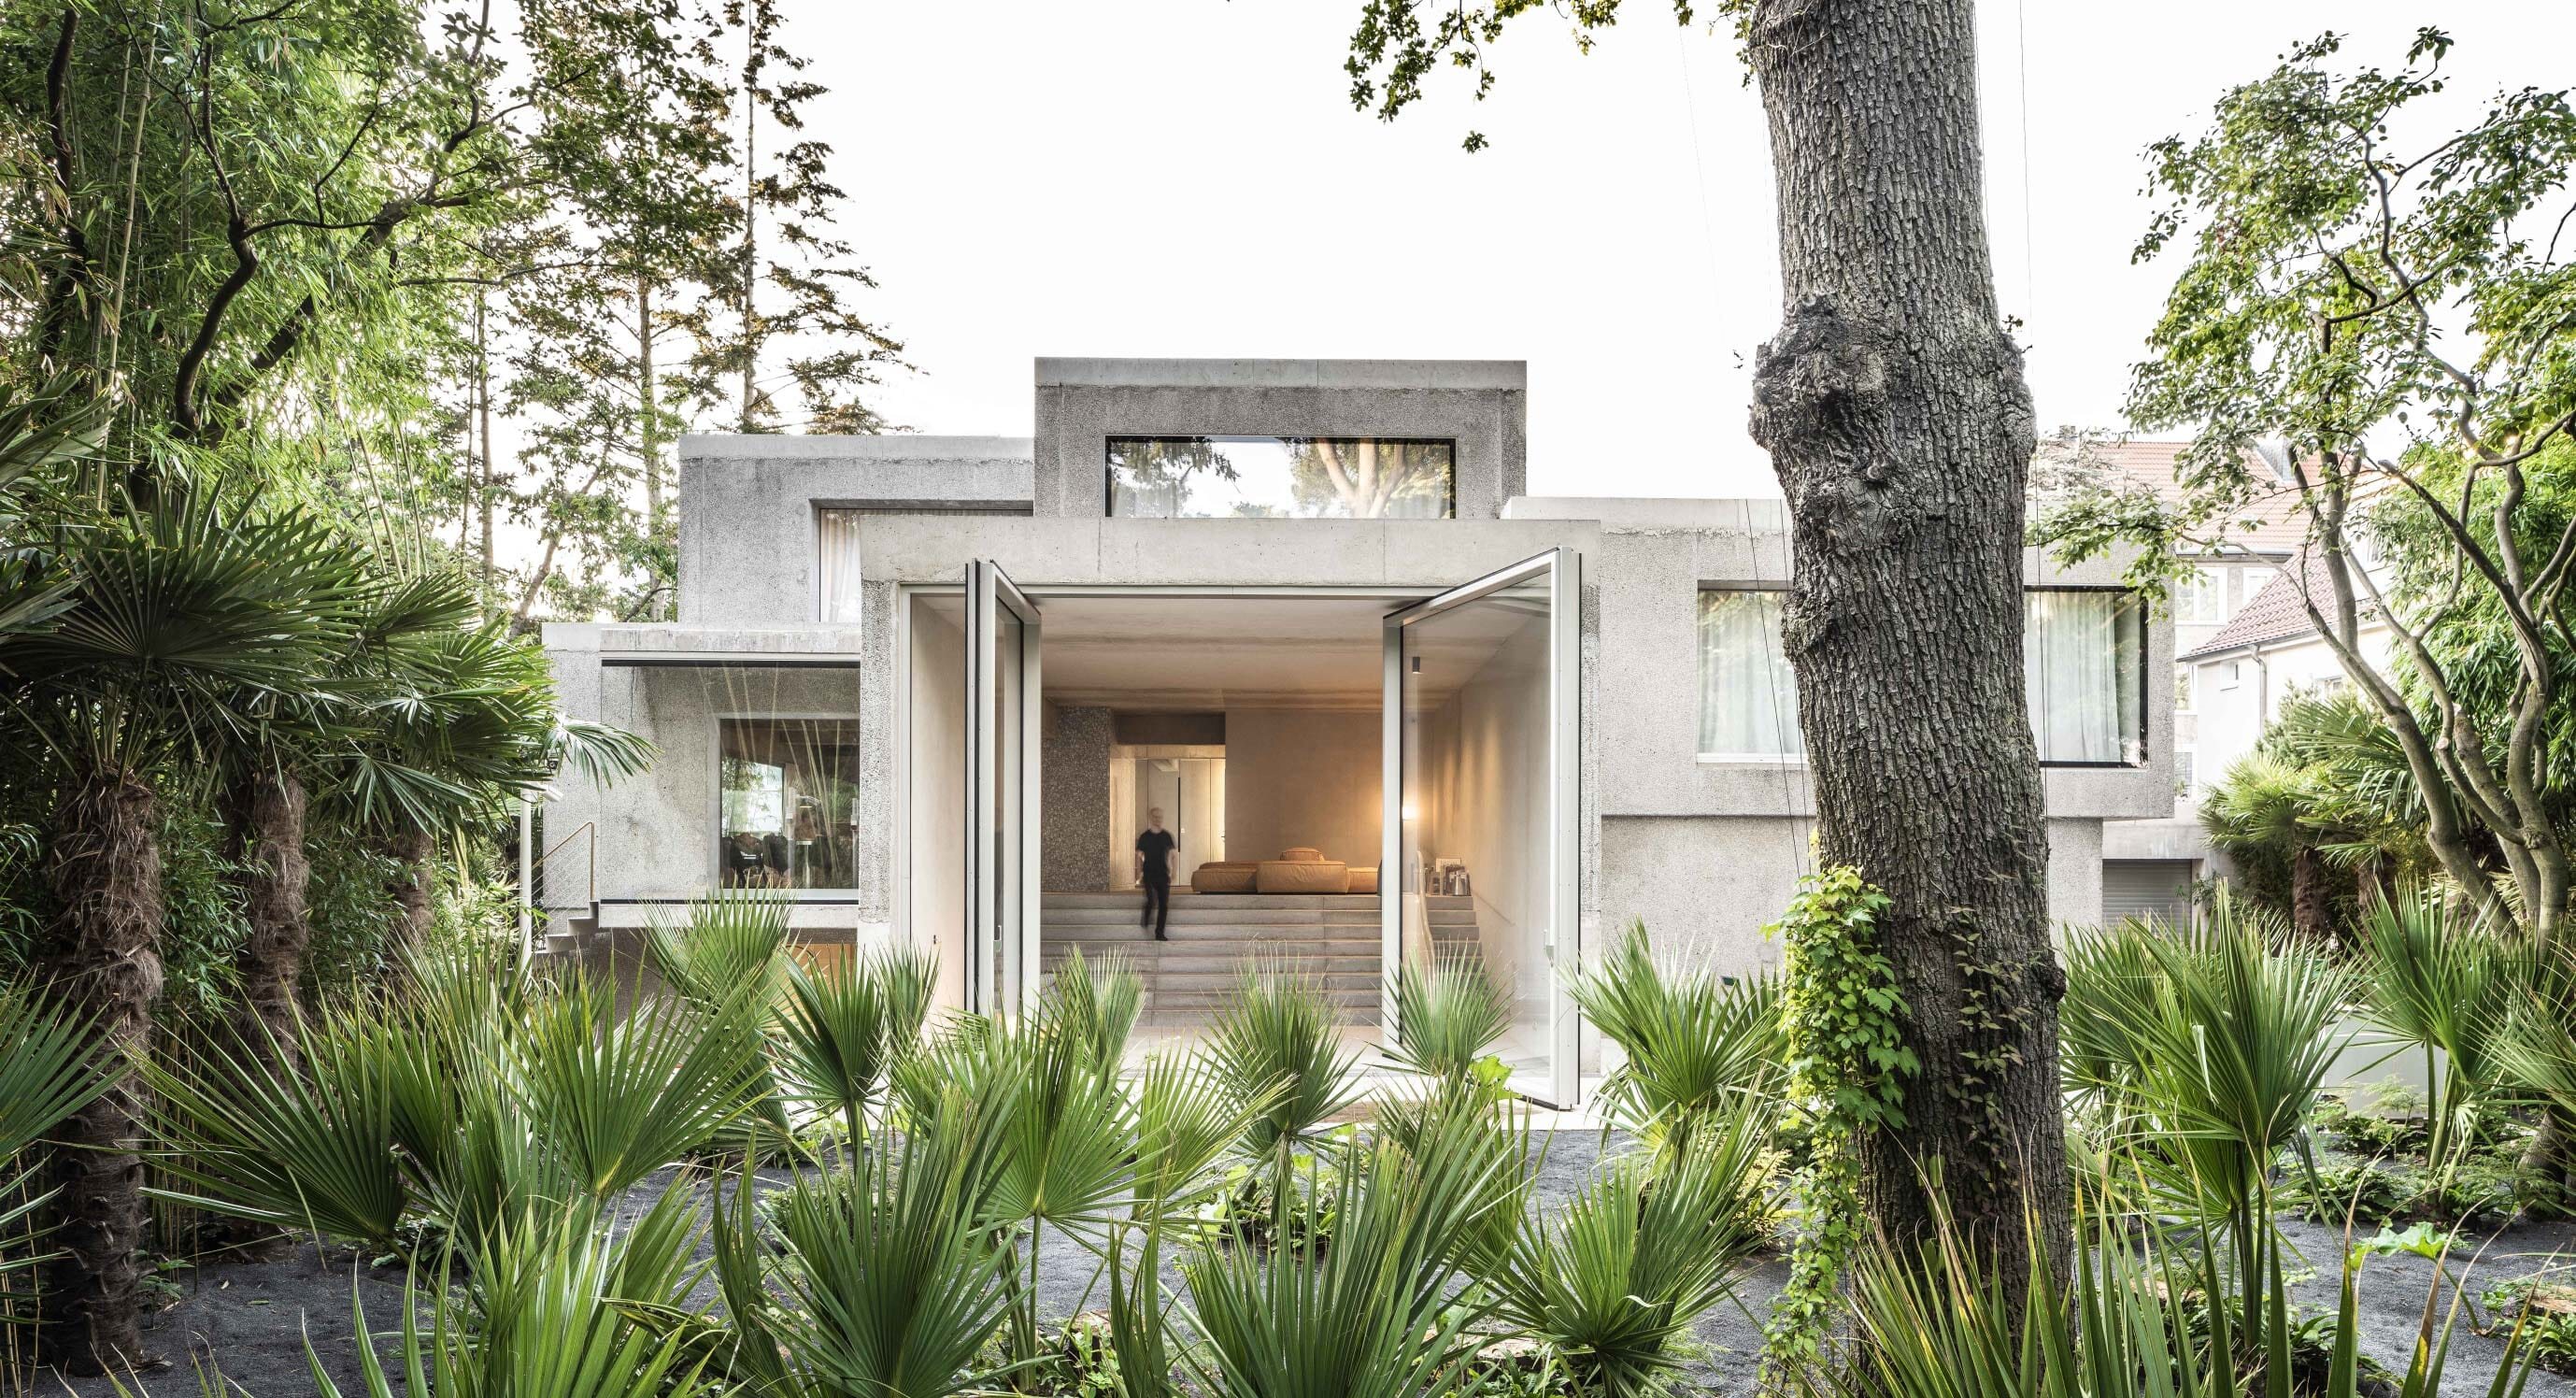 Casa Morgana Is A Project Of Contrast